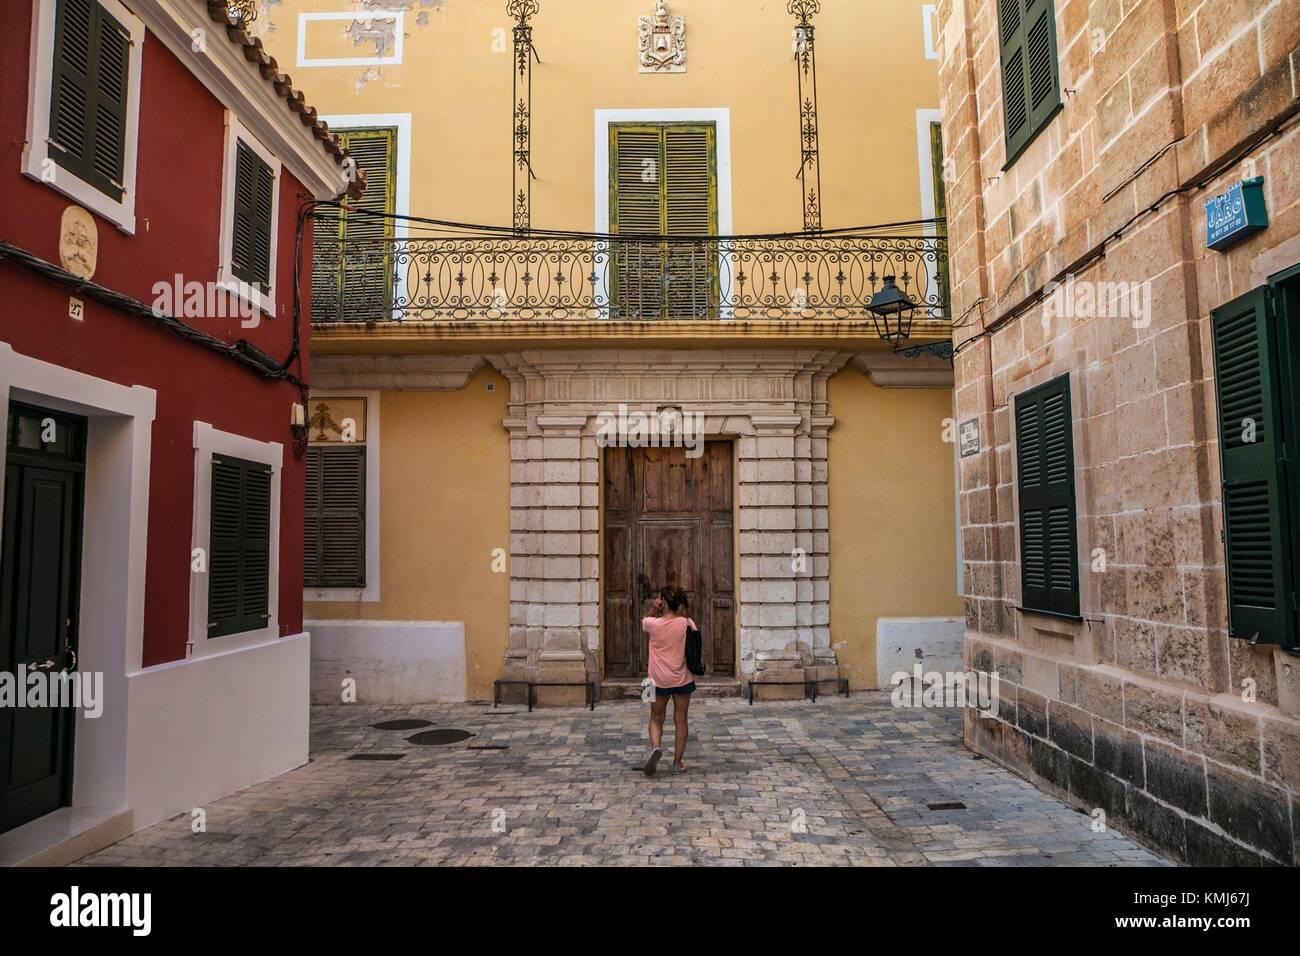 Kann Squella Barockschloss, dem XVIII Jahrhundert. Der Parc de la Ciutadella. Menorca. Balearen. Spanien Stockbild